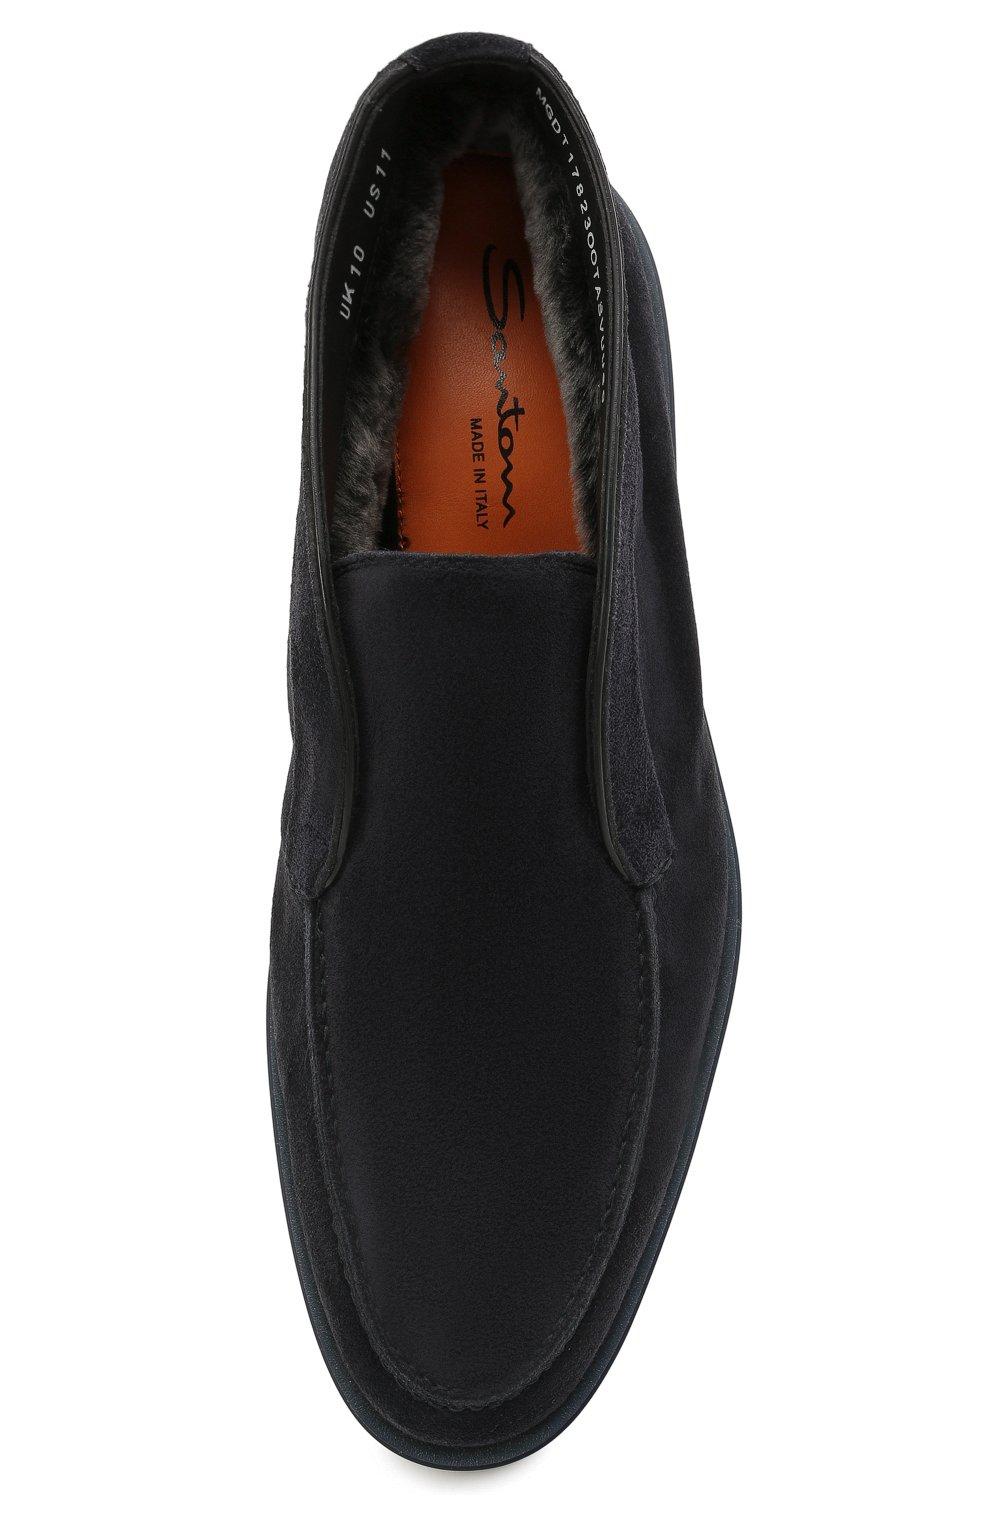 Мужские замшевые ботинки SANTONI темно-синего цвета, арт. MGDT1782300TASVUU60   Фото 5 (Мужское Кросс-КТ: Ботинки-обувь, зимние ботинки; Подошва: Плоская)